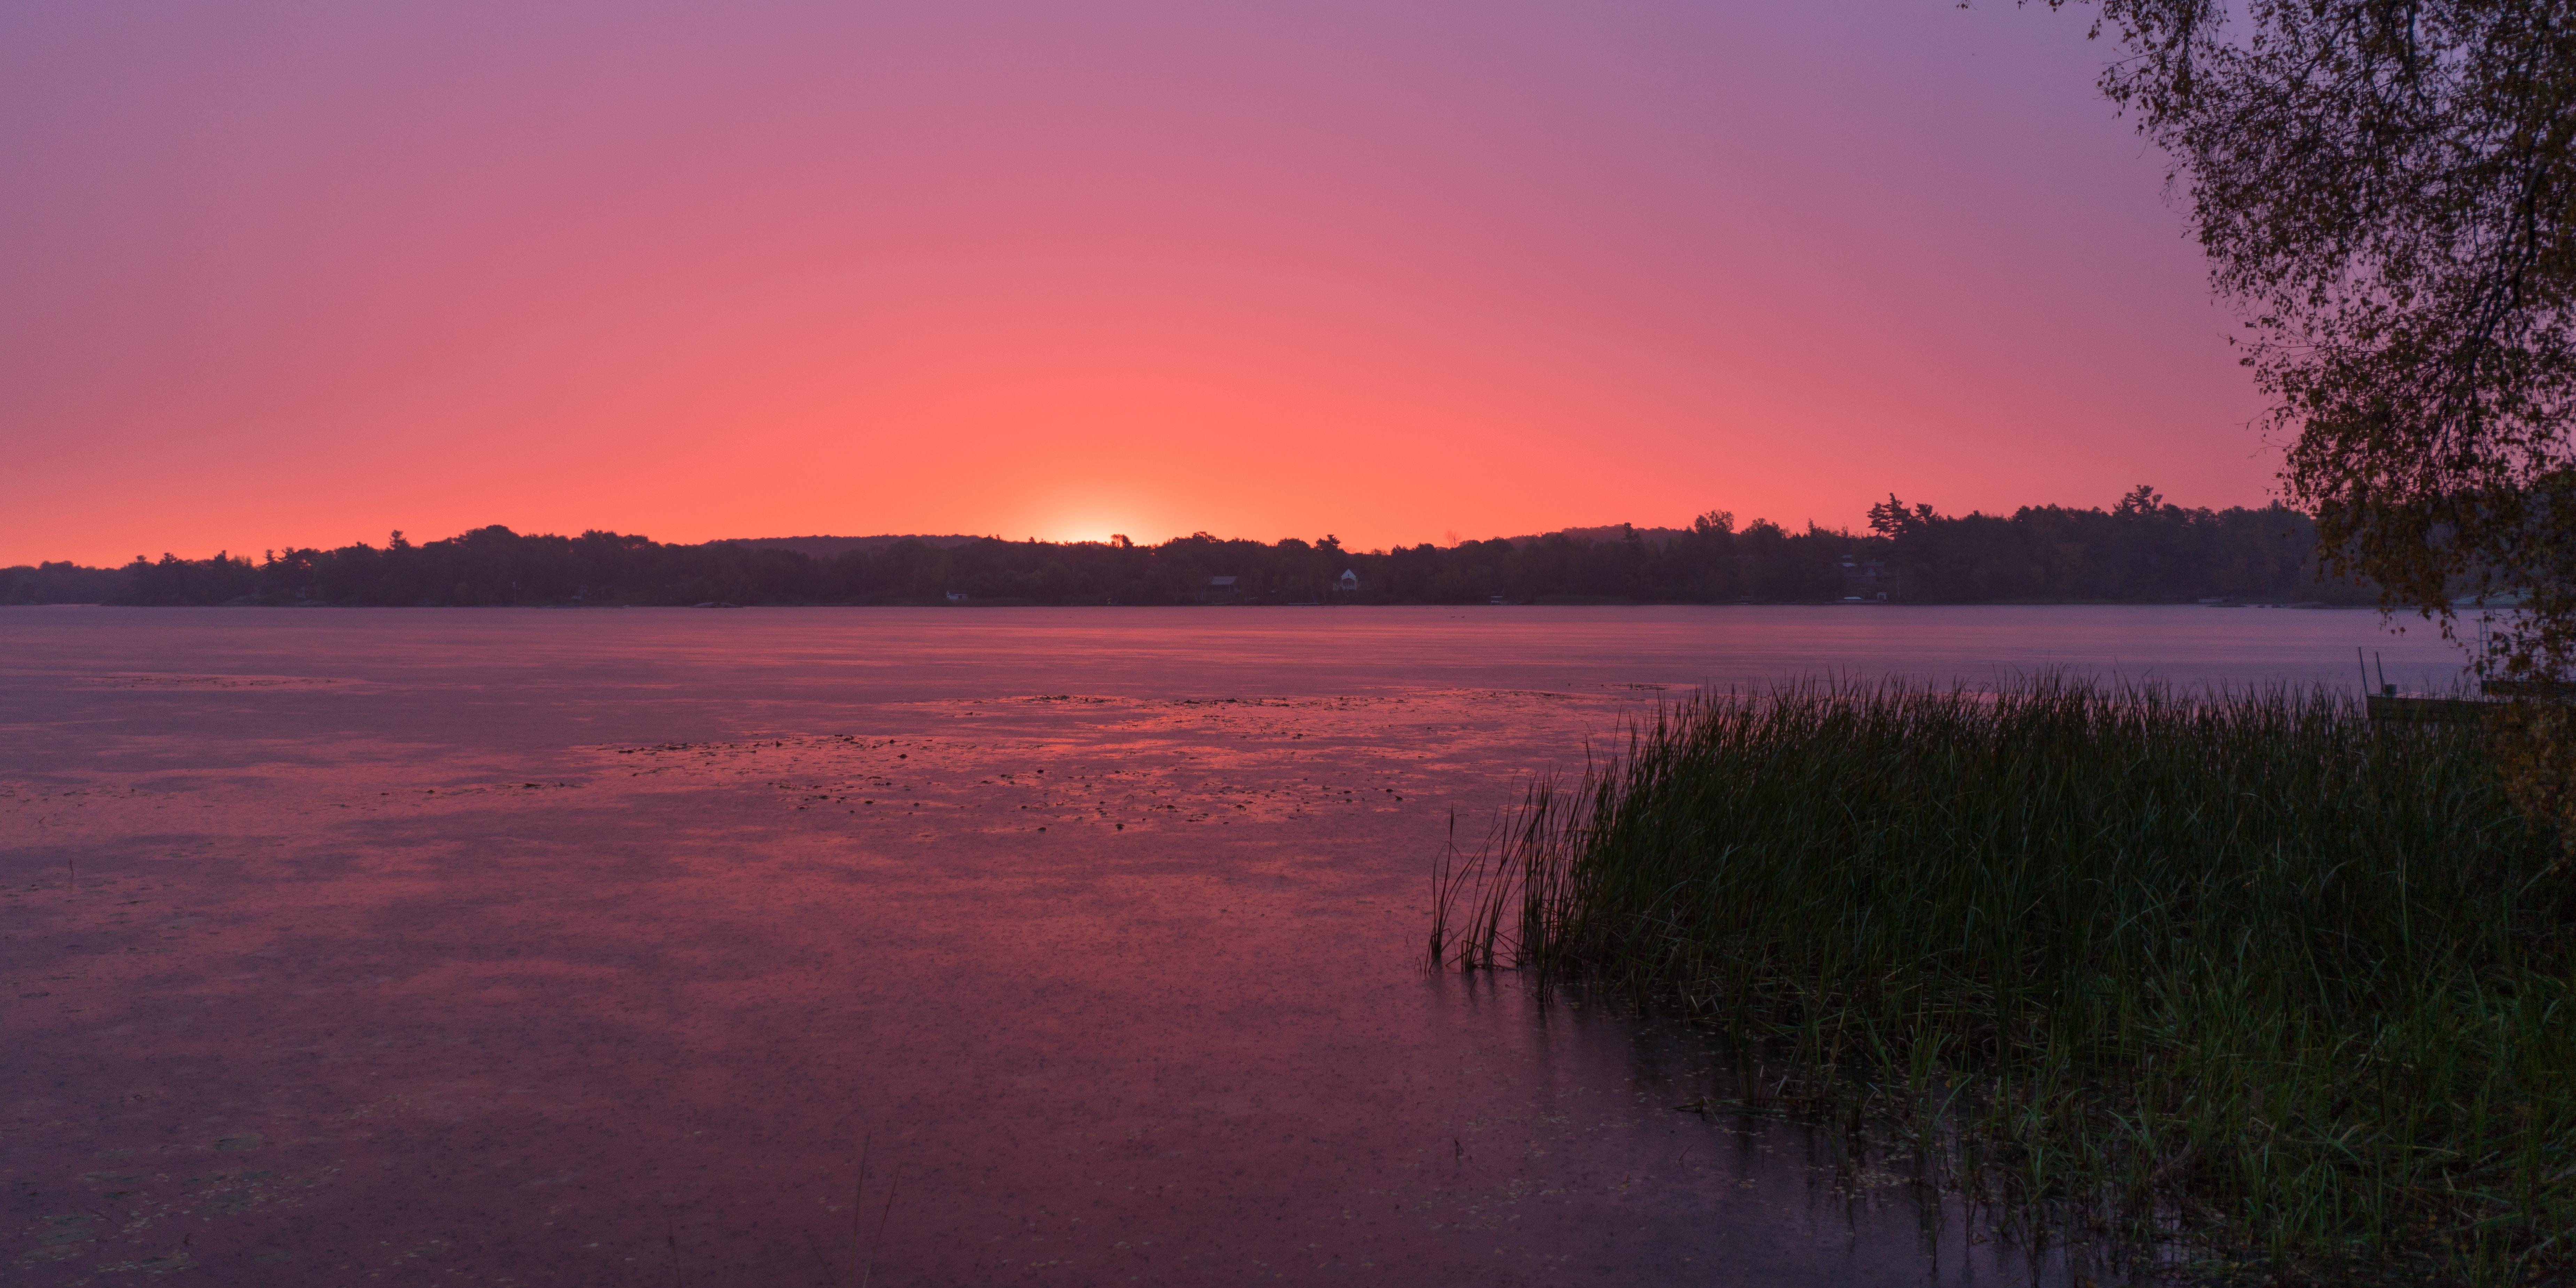 Duncan-Rawlinson-Photo-269599-Sunrise-1000-Islands-Ontario-Canada-20151013-DSC05444